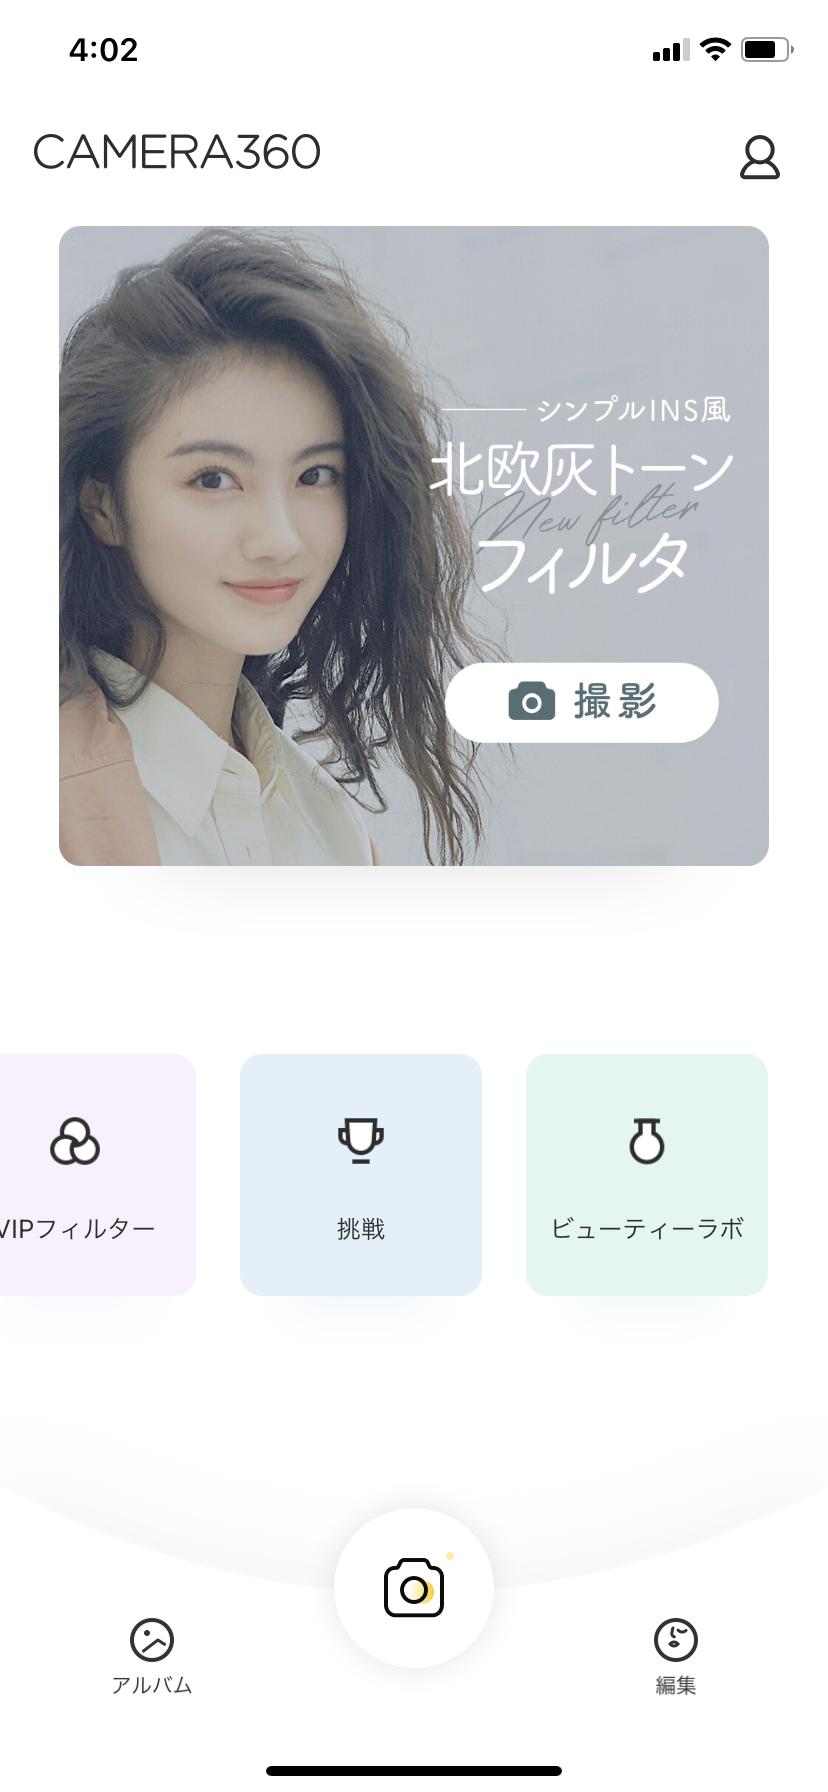 PinGuo(ピングオ) カメラ360を使ったヨコさんのクチコミ画像1